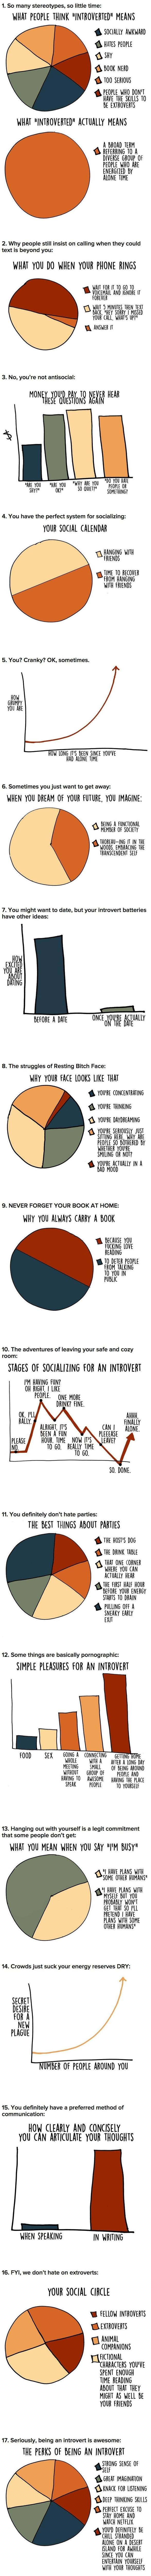 Introvert graphs